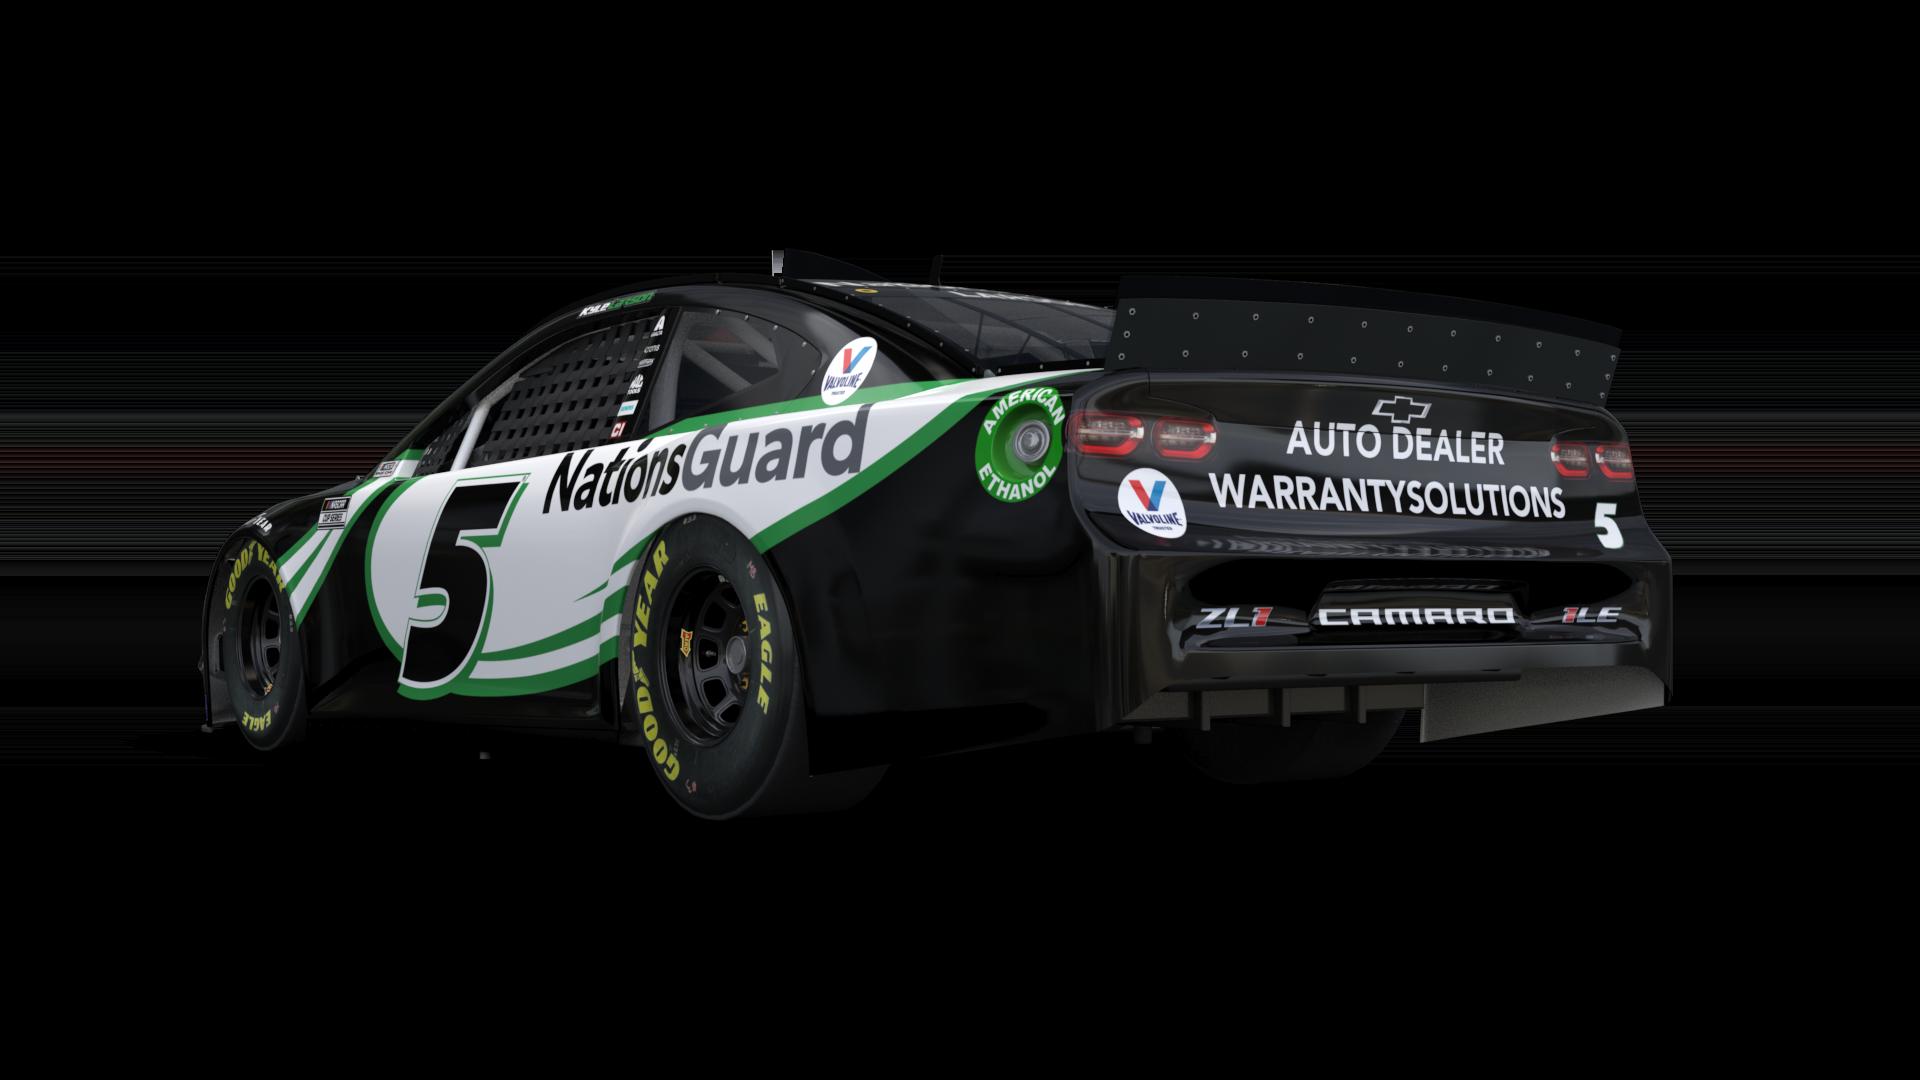 Kyle Larson S 2021 Car And Nascar Sponsor Revealed Racing News